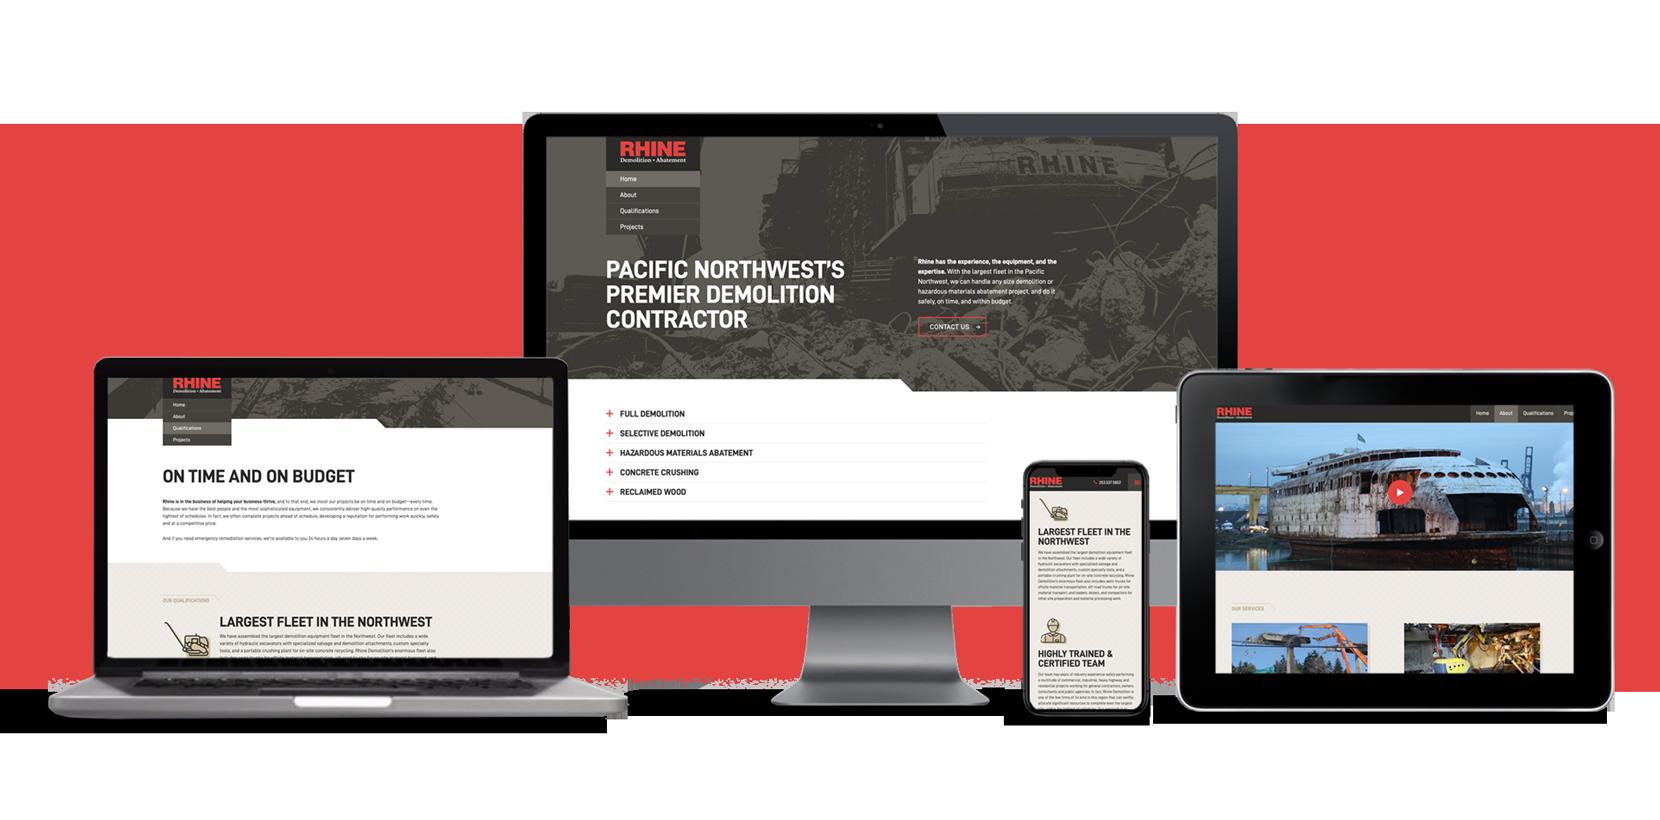 Rhine Demolition Mobile responsive website design by Rusty George Creative